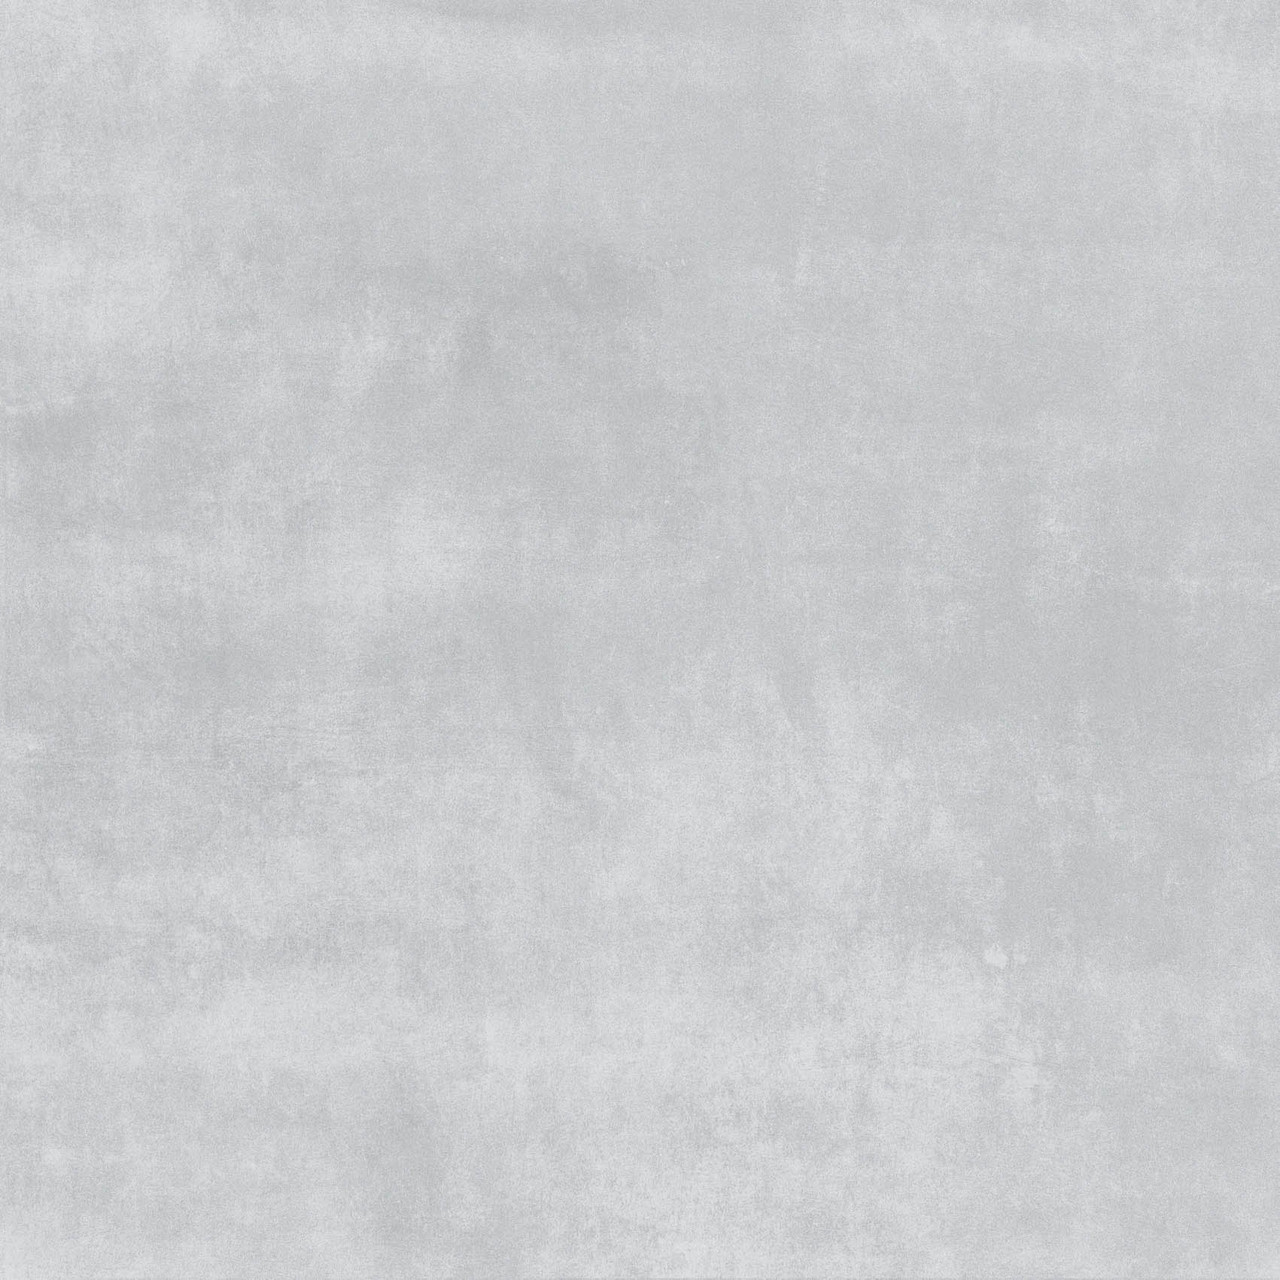 Плитка Грес Golden Tile Street Line светло-серая матовая (600х600х10мм)